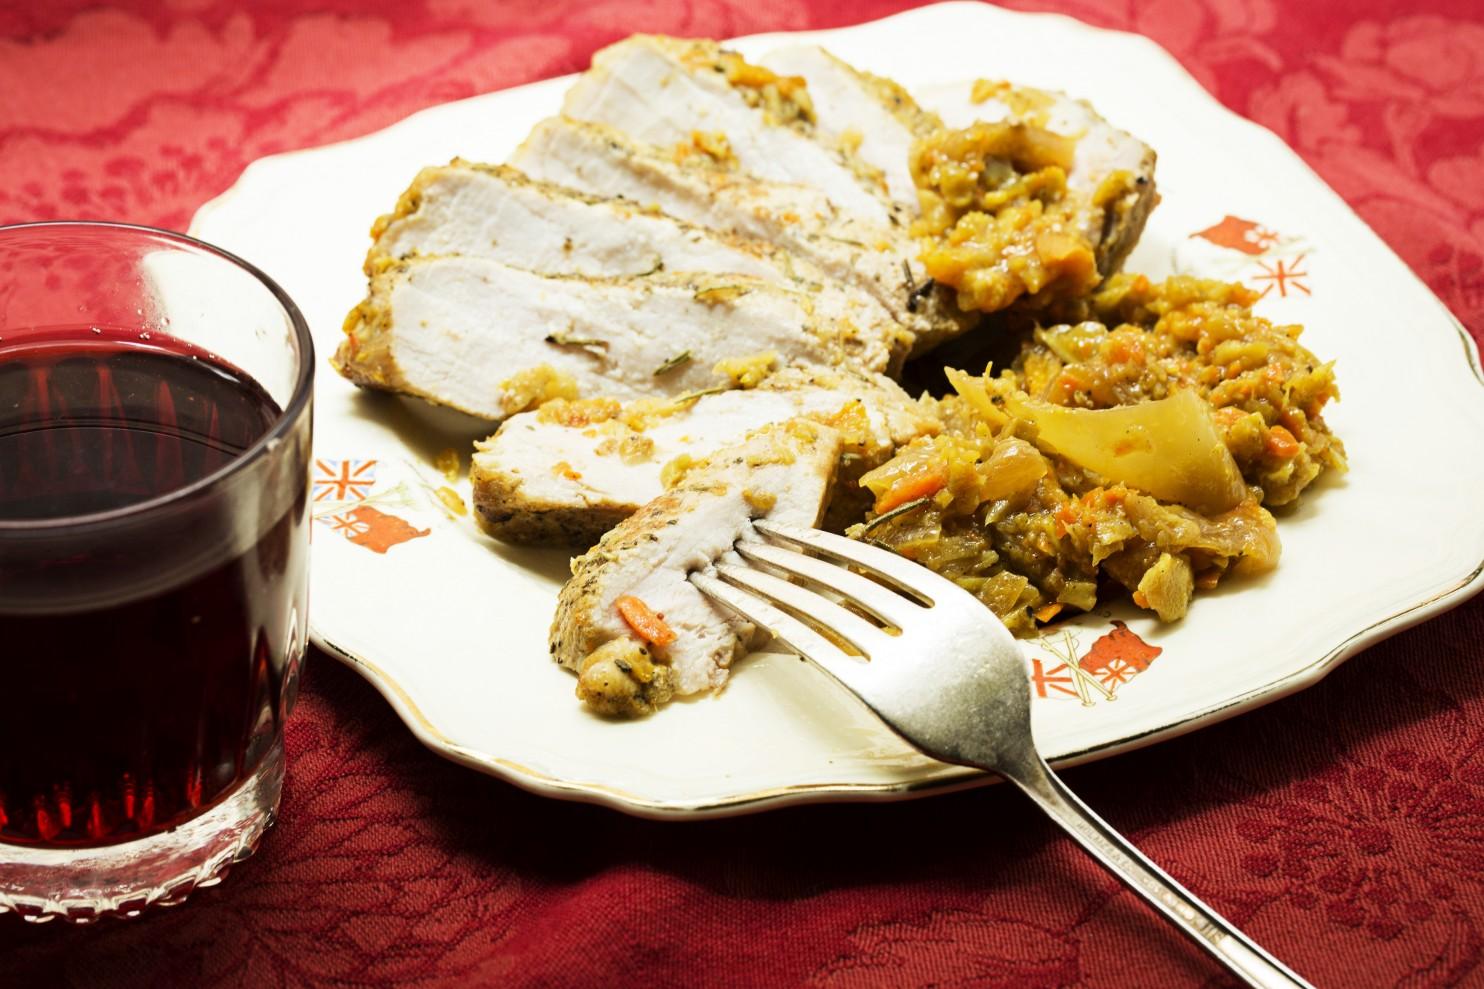 Herb-Rubbed Pork Chops with Warm Broccoli Slaw